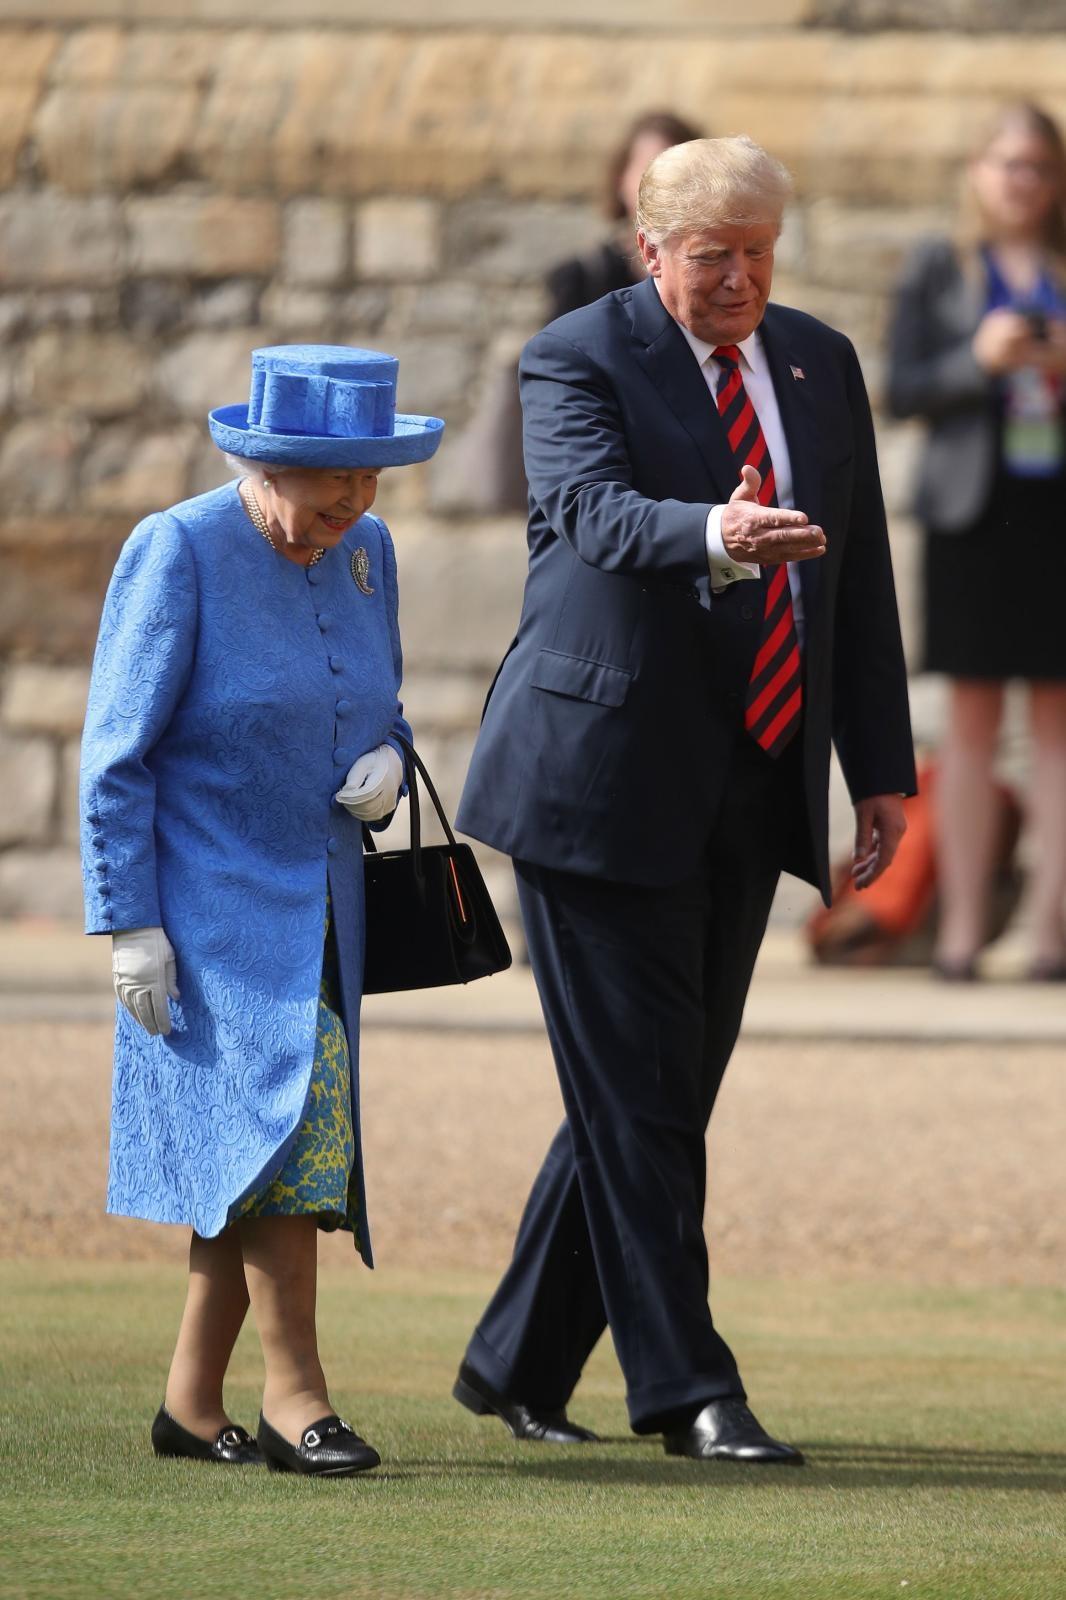 Trump pred kraljico Vir:Pixell